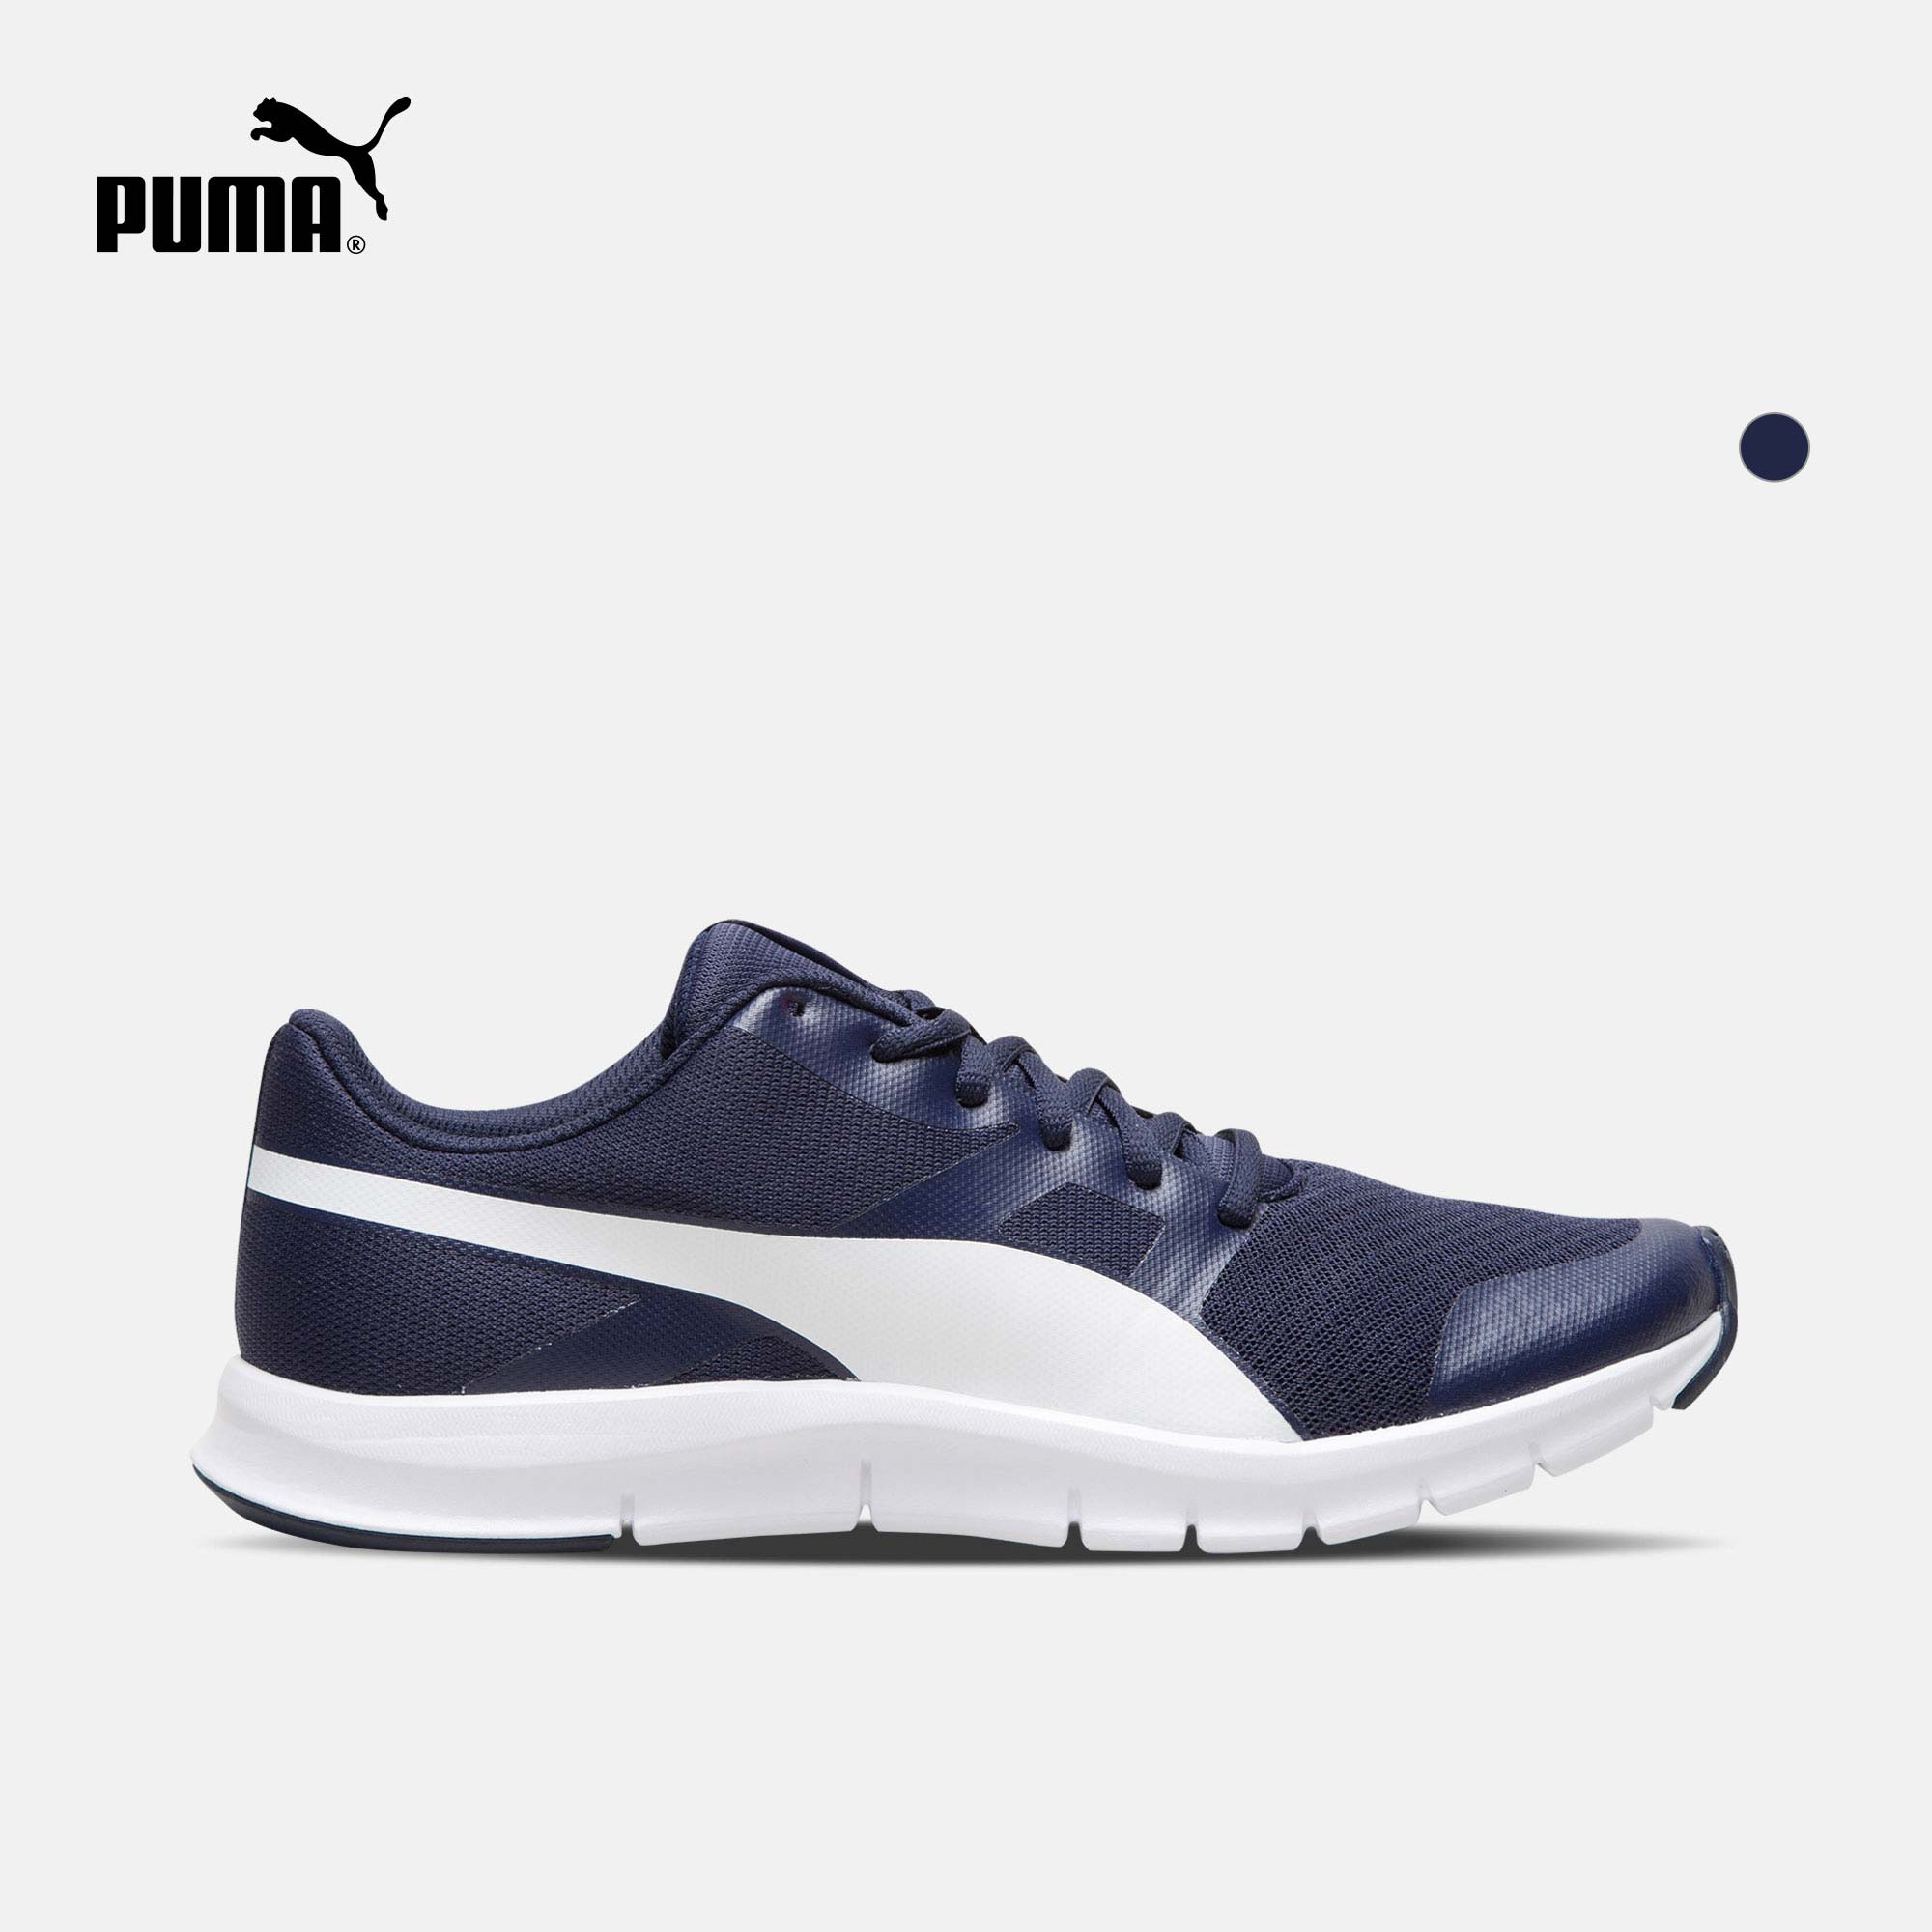 Puma彪马 慢跑鞋好不好,慢跑鞋哪个牌